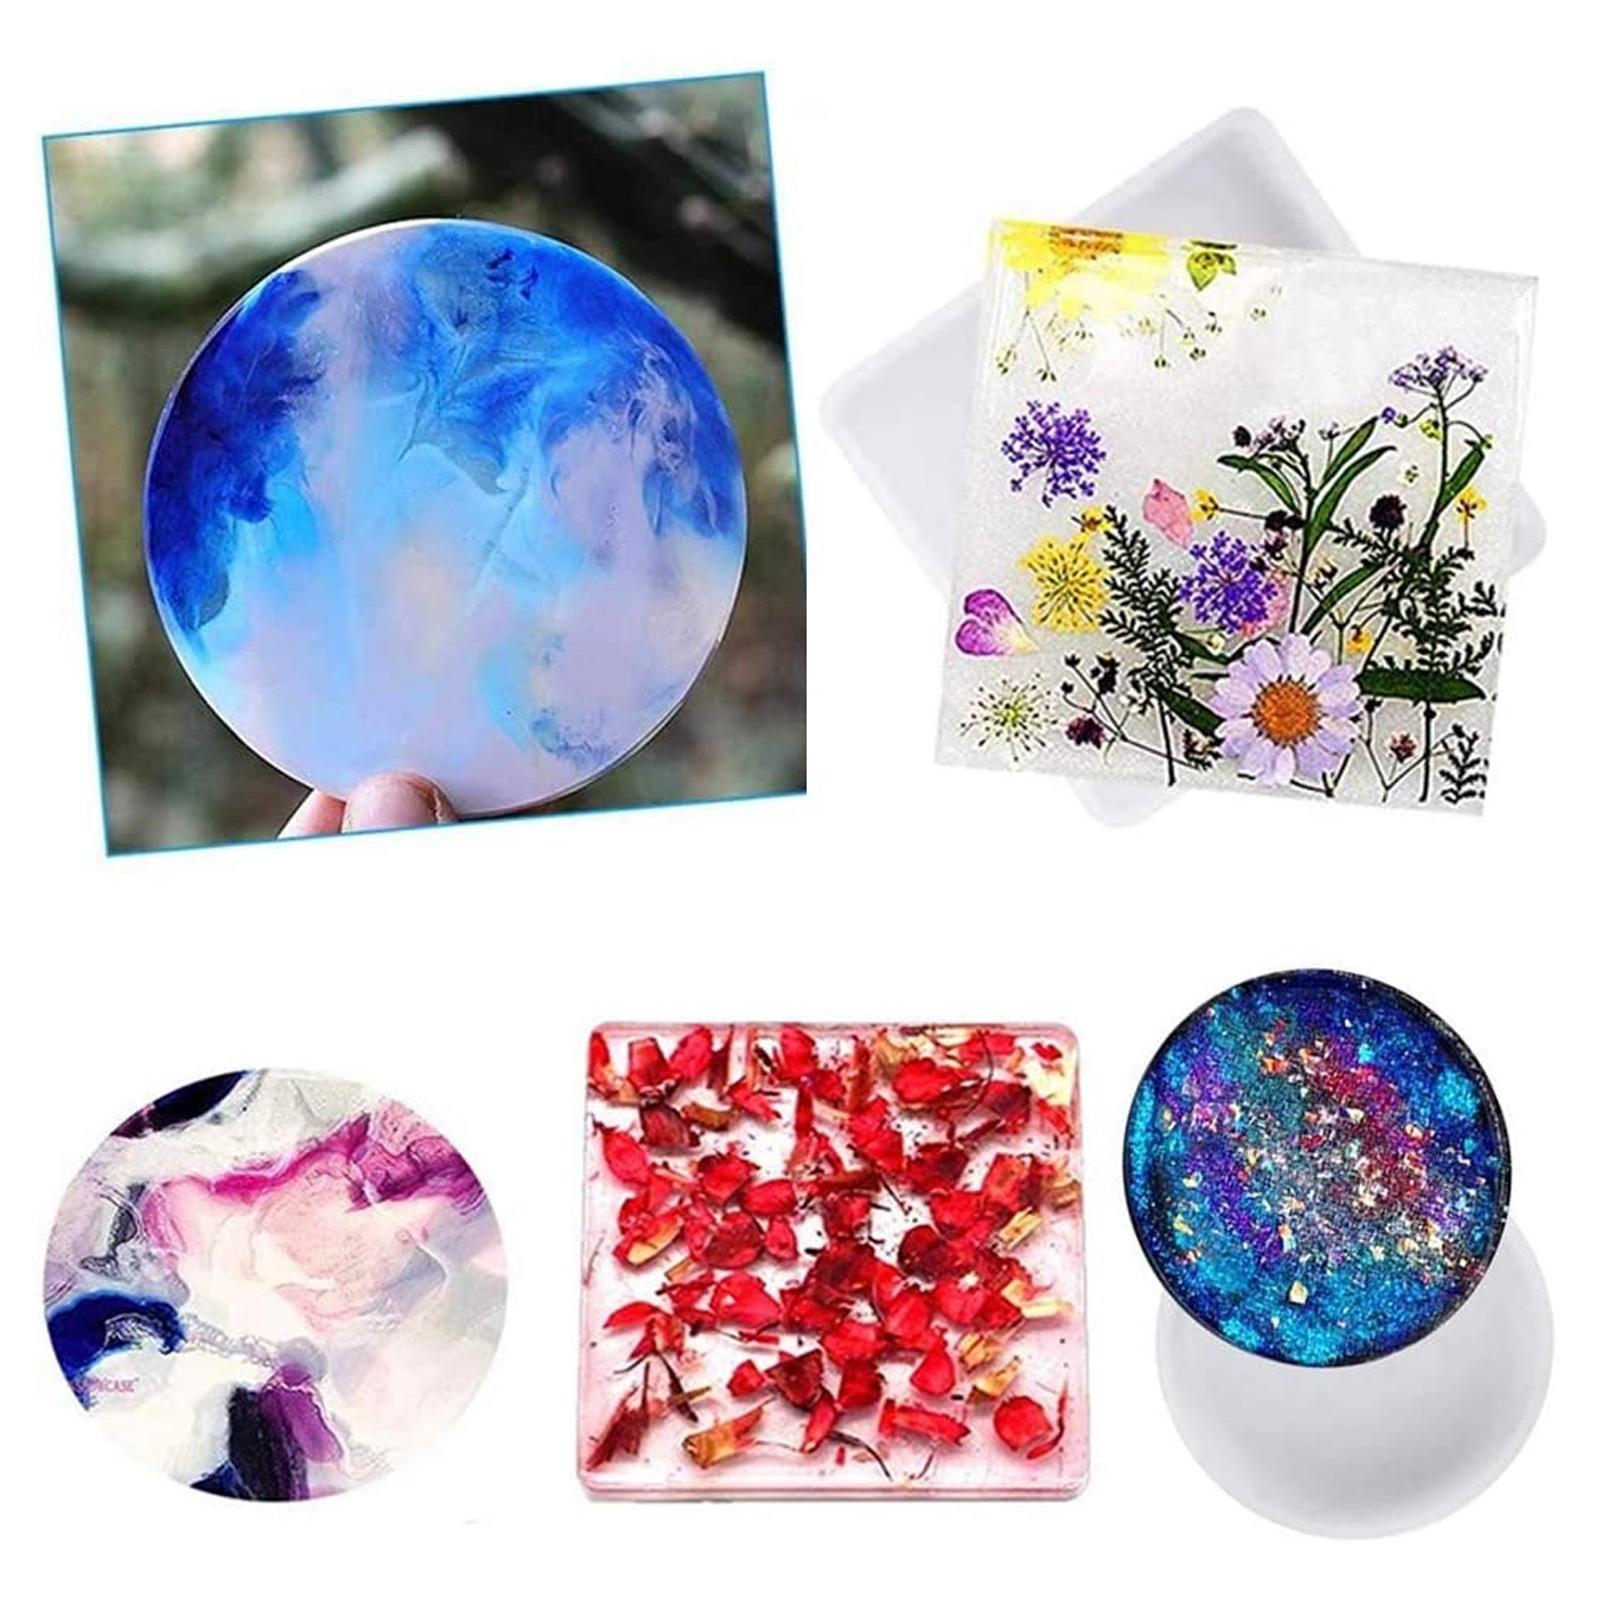 Silicone-Resin-Molds-Epoxy-Casting-Art-Coaster-Ashtray-Bowl-Mat-DIY-Craft-Tool thumbnail 6